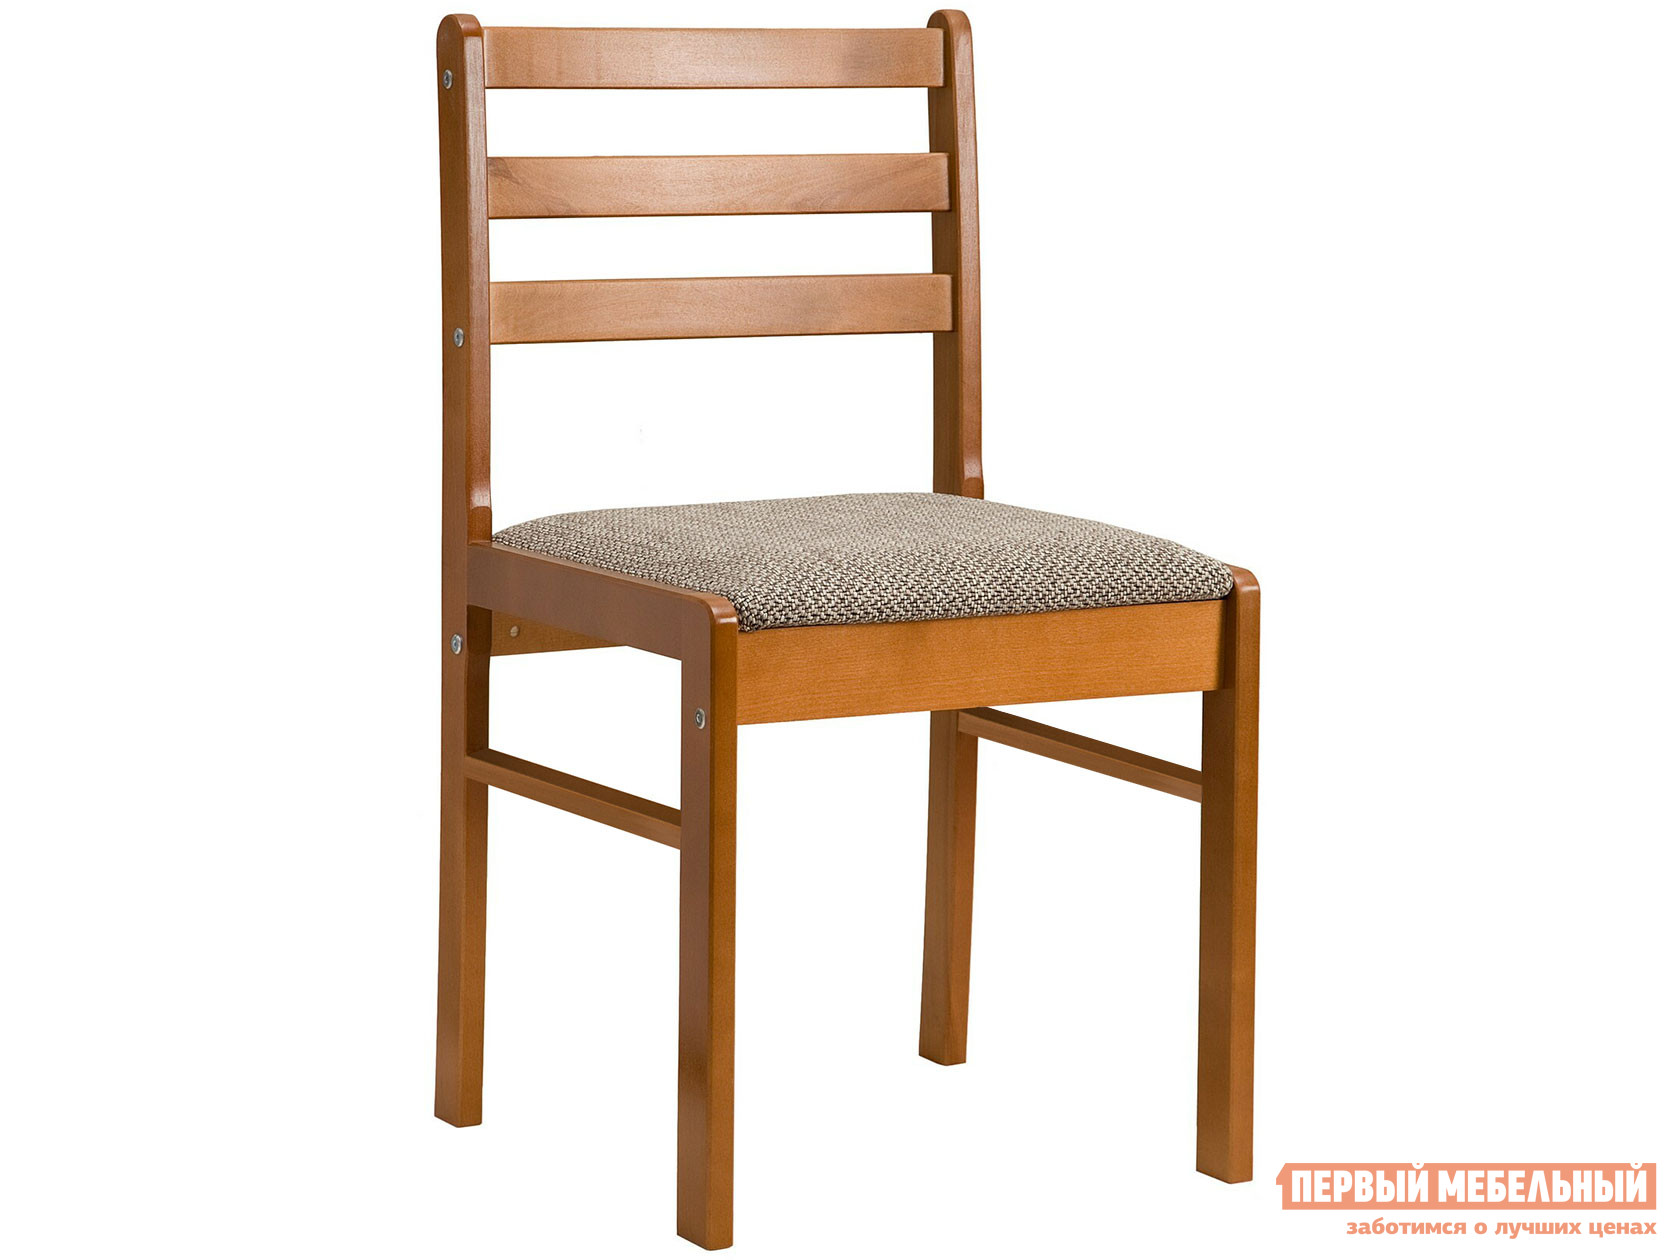 Кухонный стул Боровичи Стул полумягкий